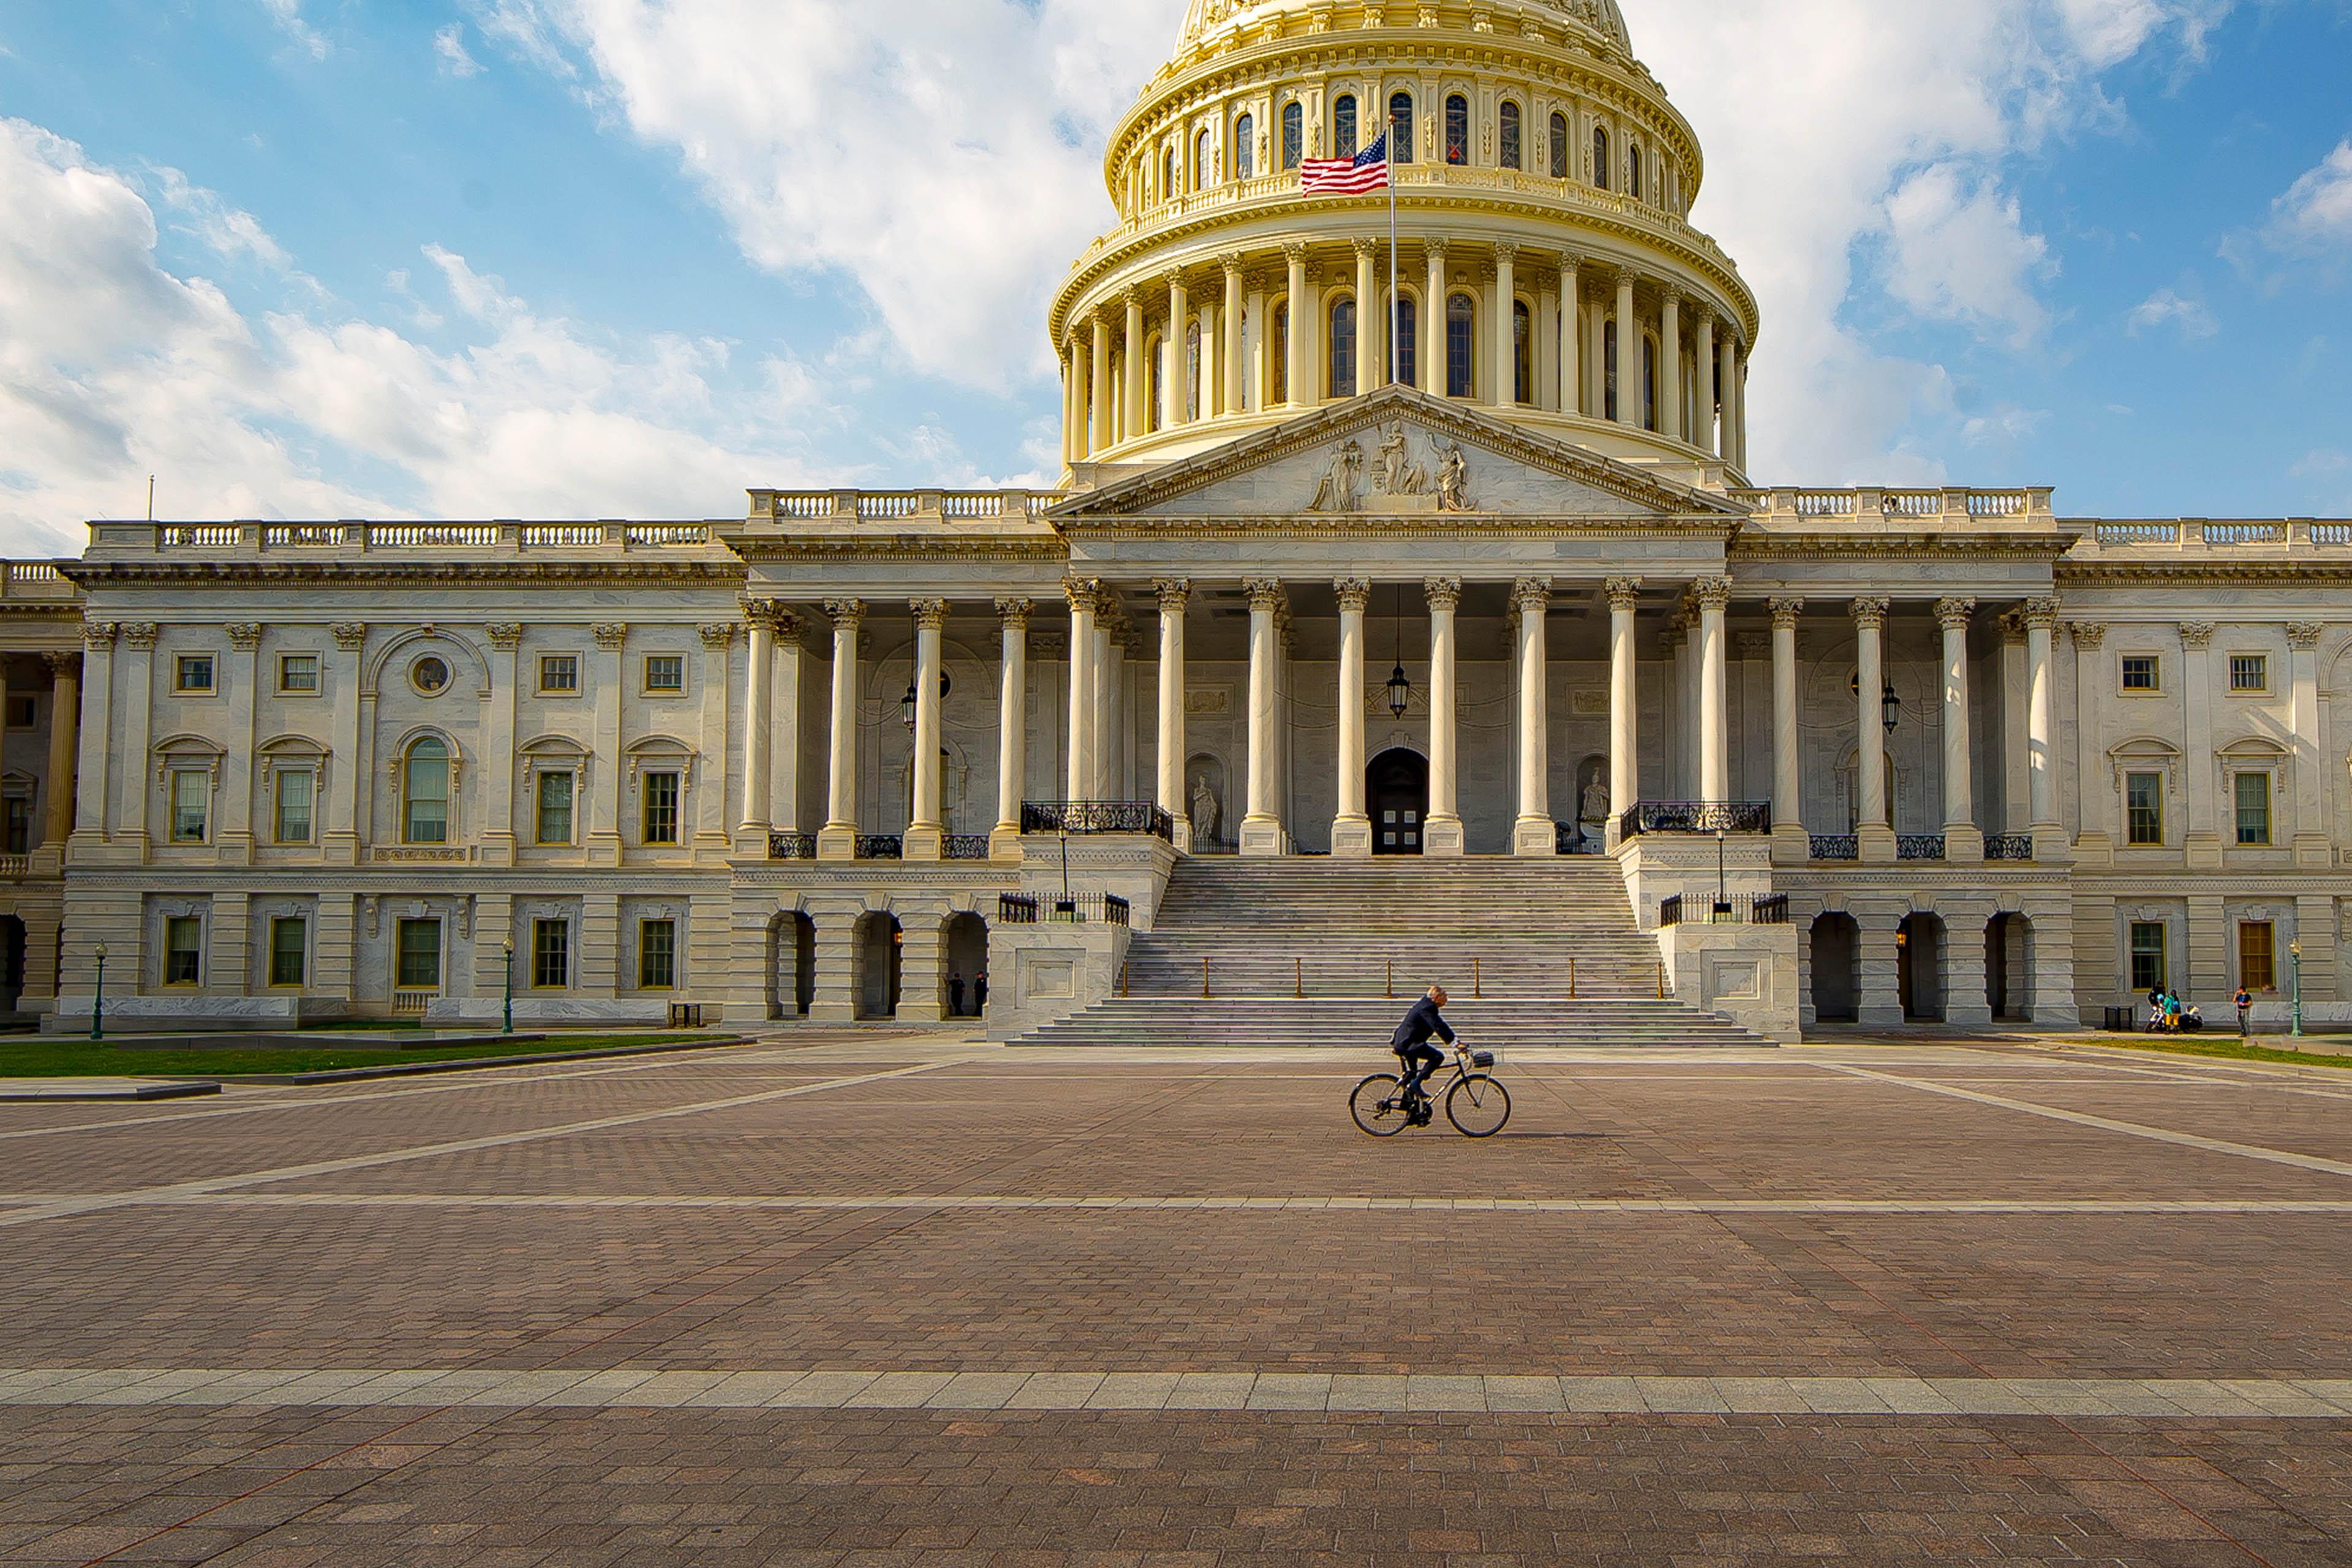 EY - US Capitol building